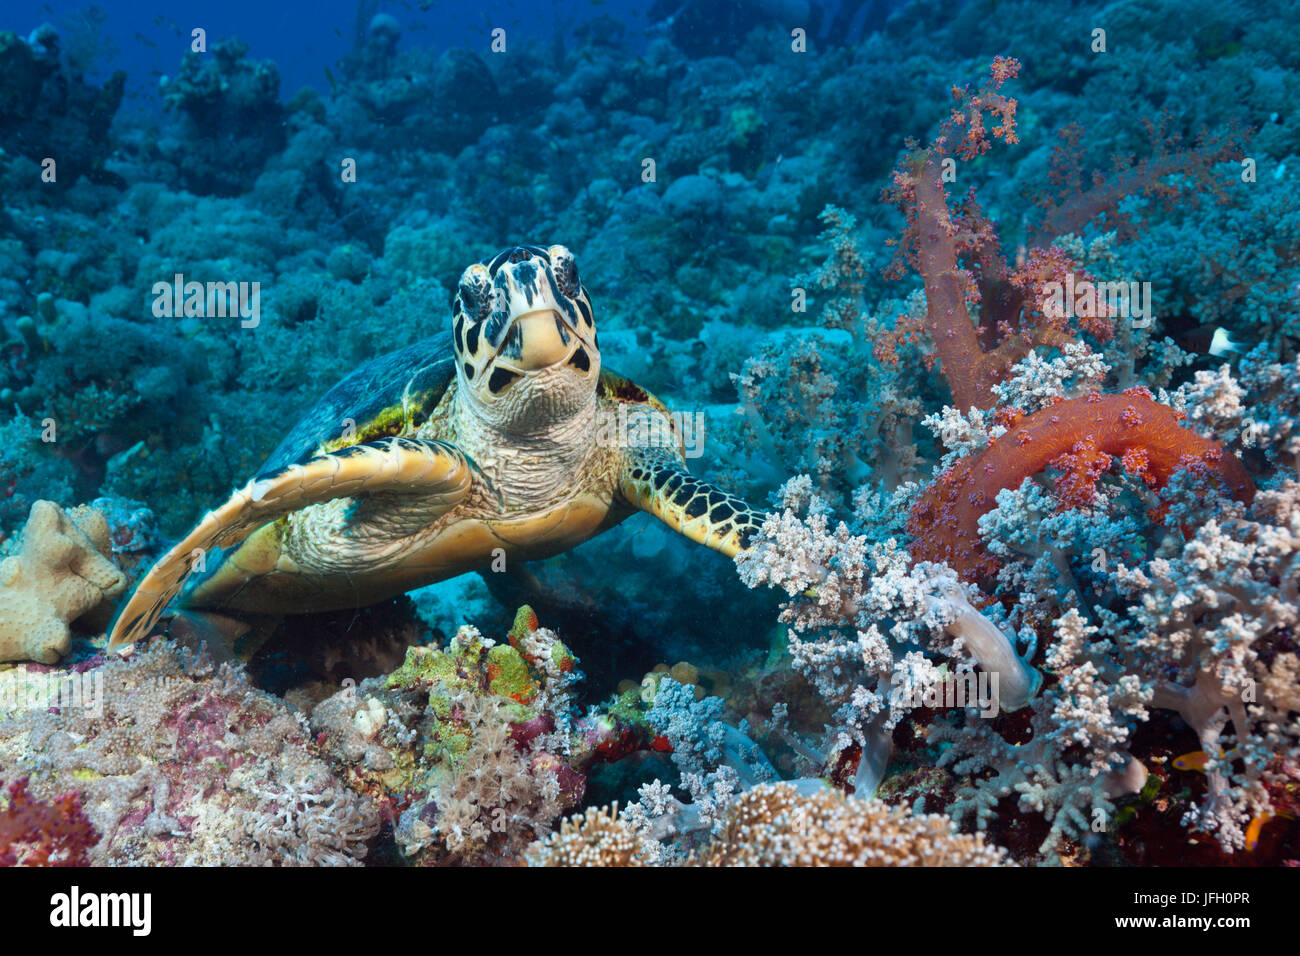 tortoiseshell turtle, Eretmochelys imbricata, the Red Sea, Ras Mohammed, Egypt - Stock Image